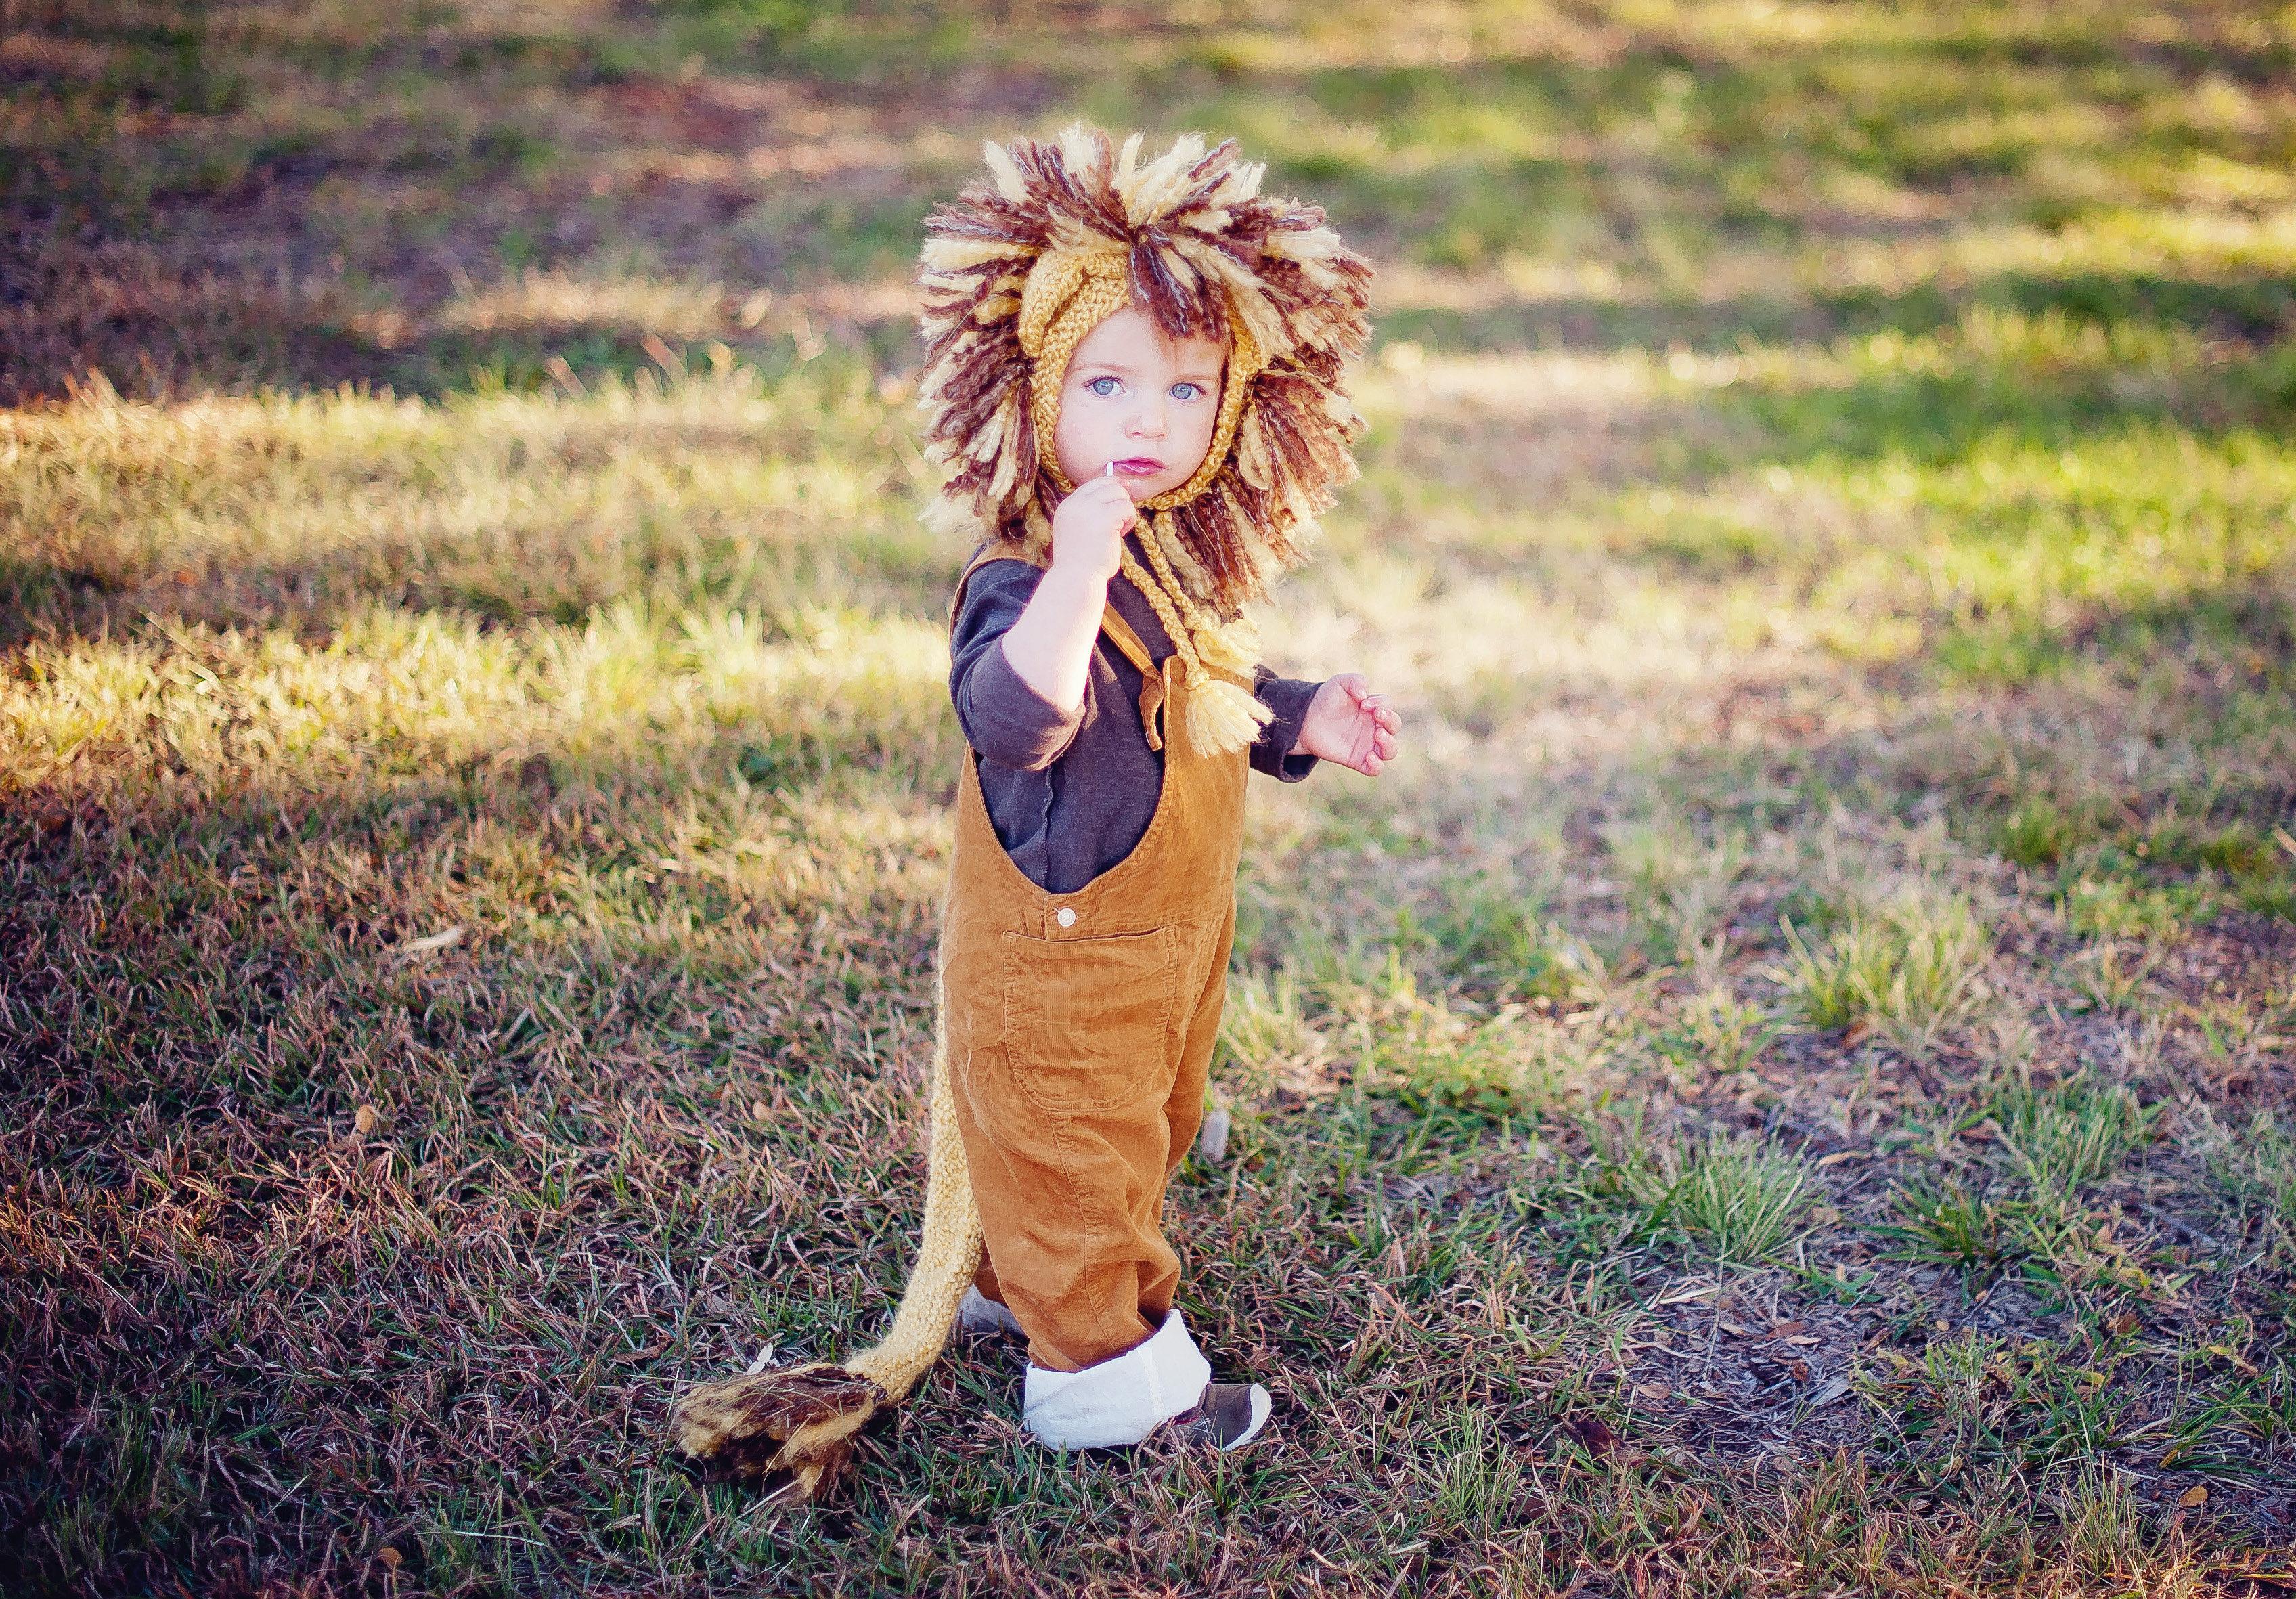 Cute Baby Costume Ideas